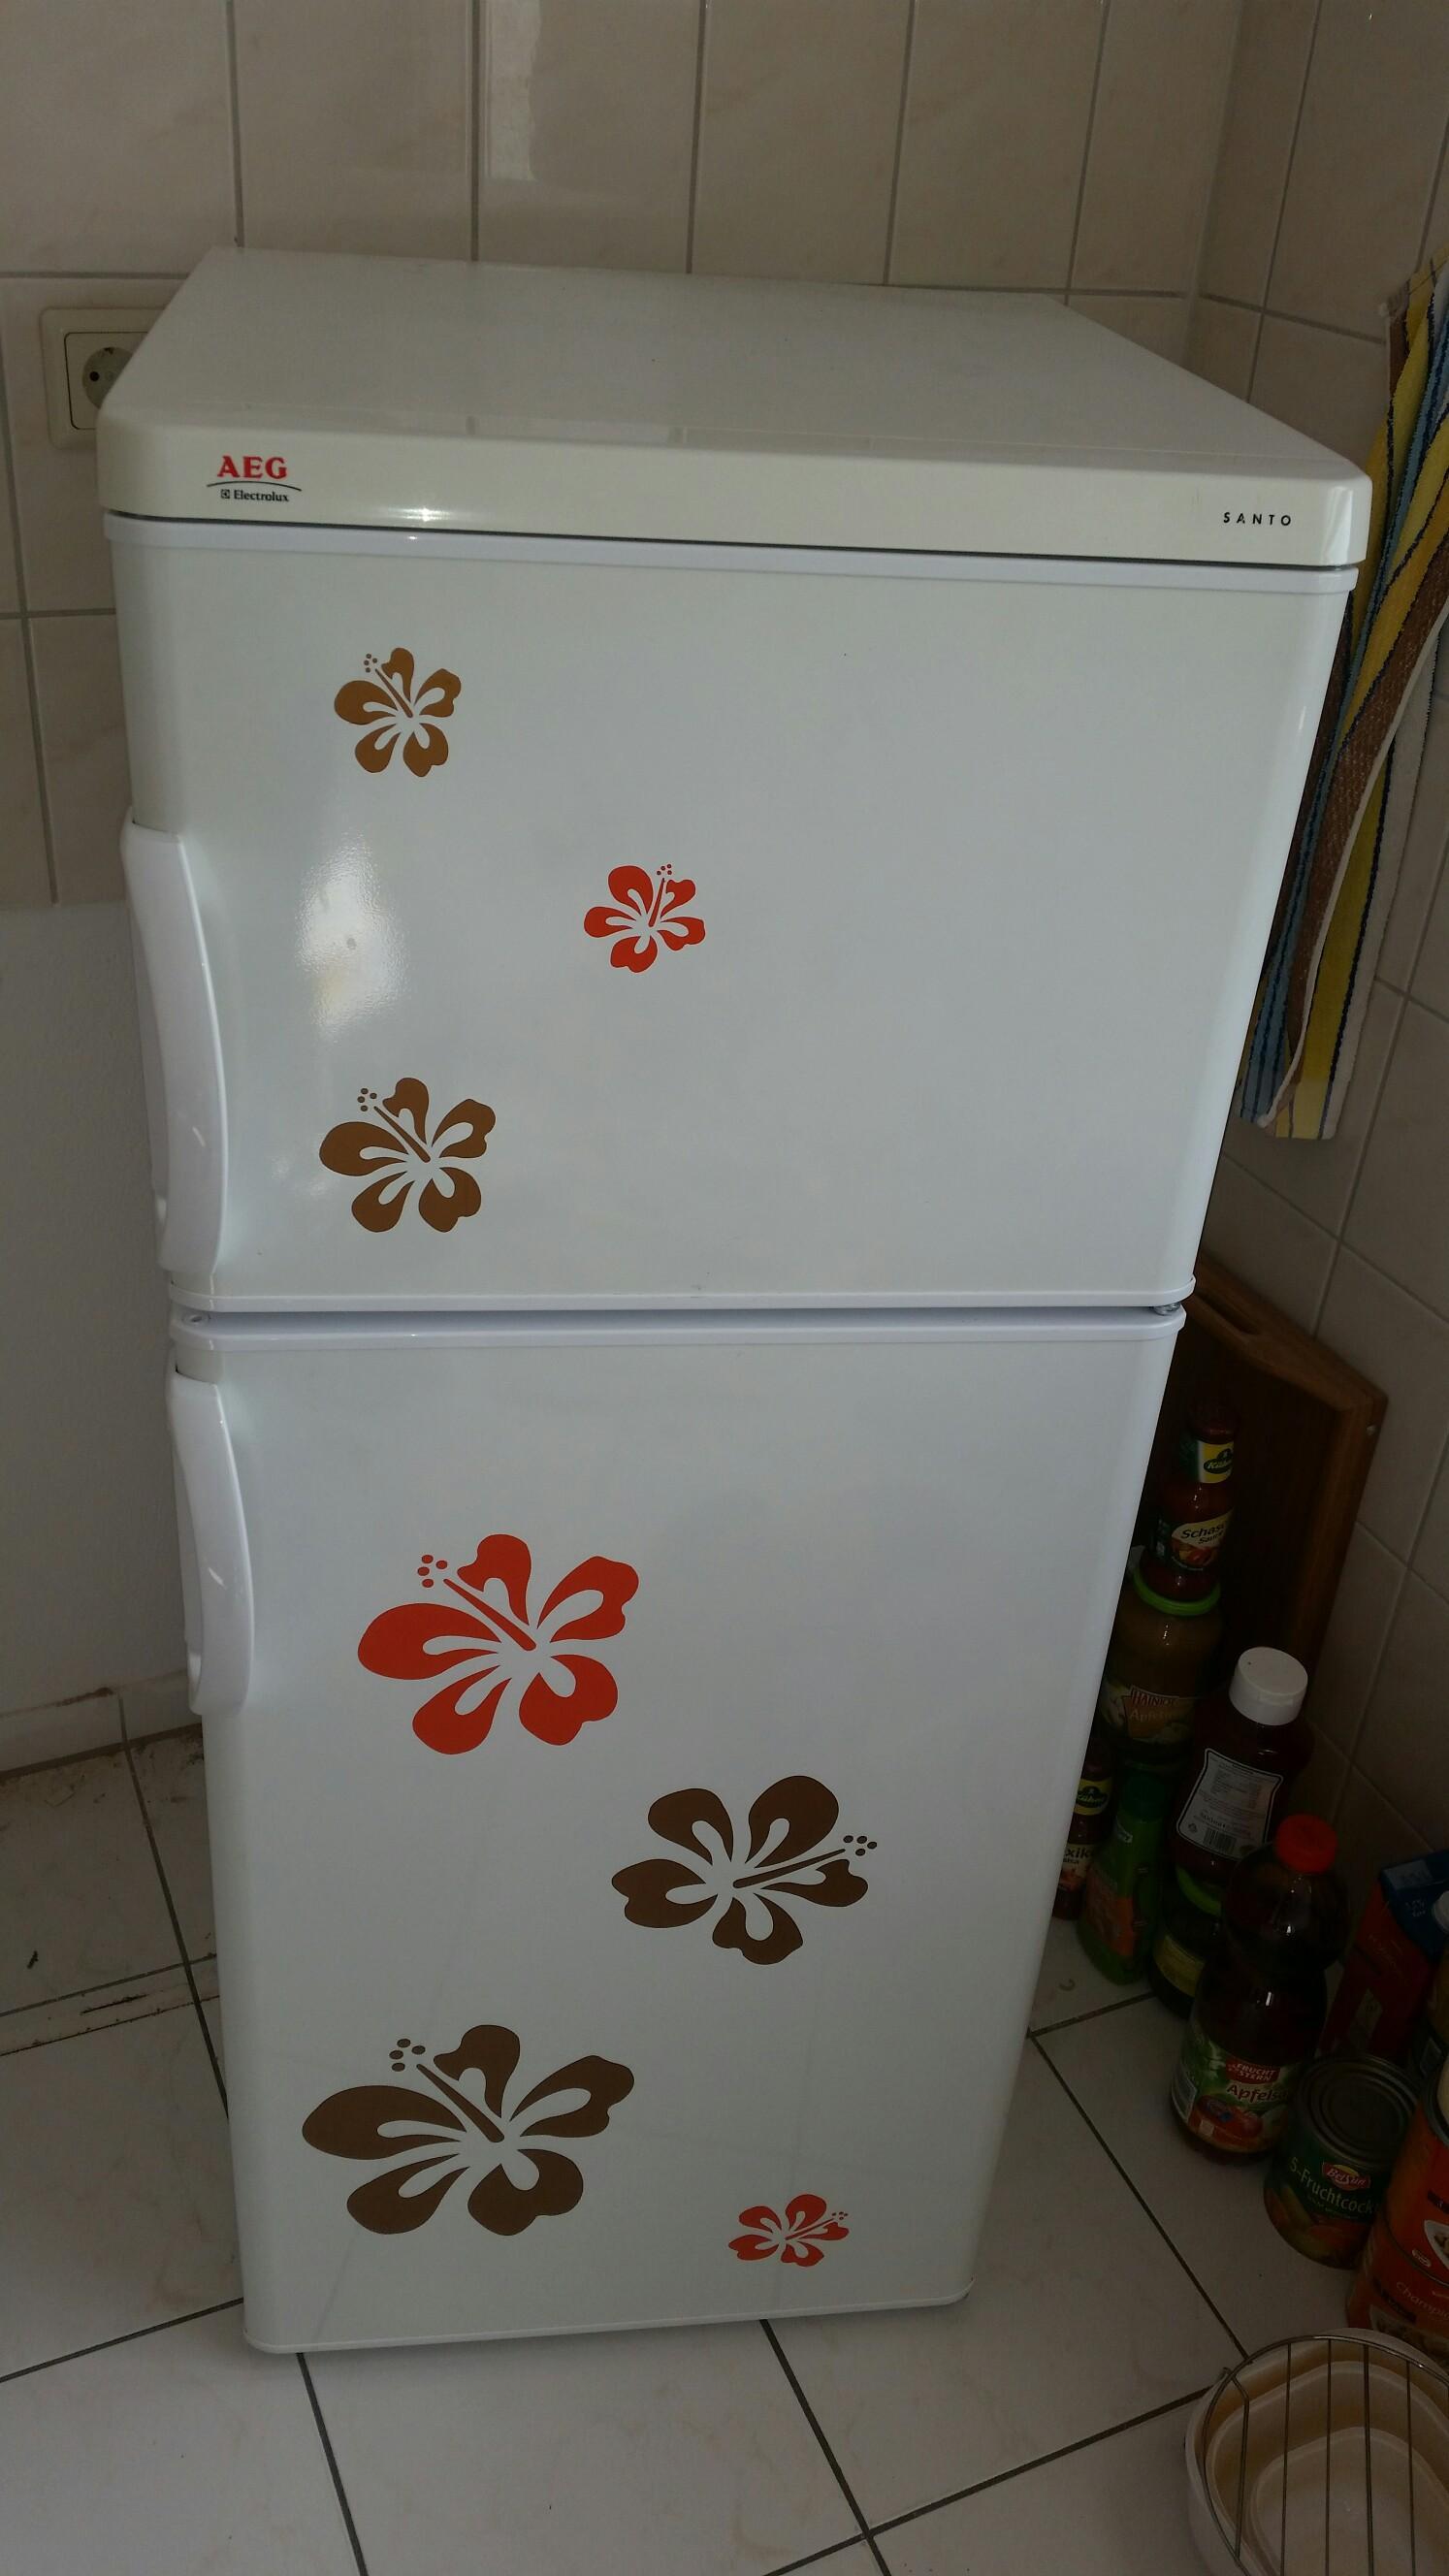 Aeg Electrolux Santo Kühlschrank : Gebraucht kühlschrank aeg santo ct kühl gefrierschr in